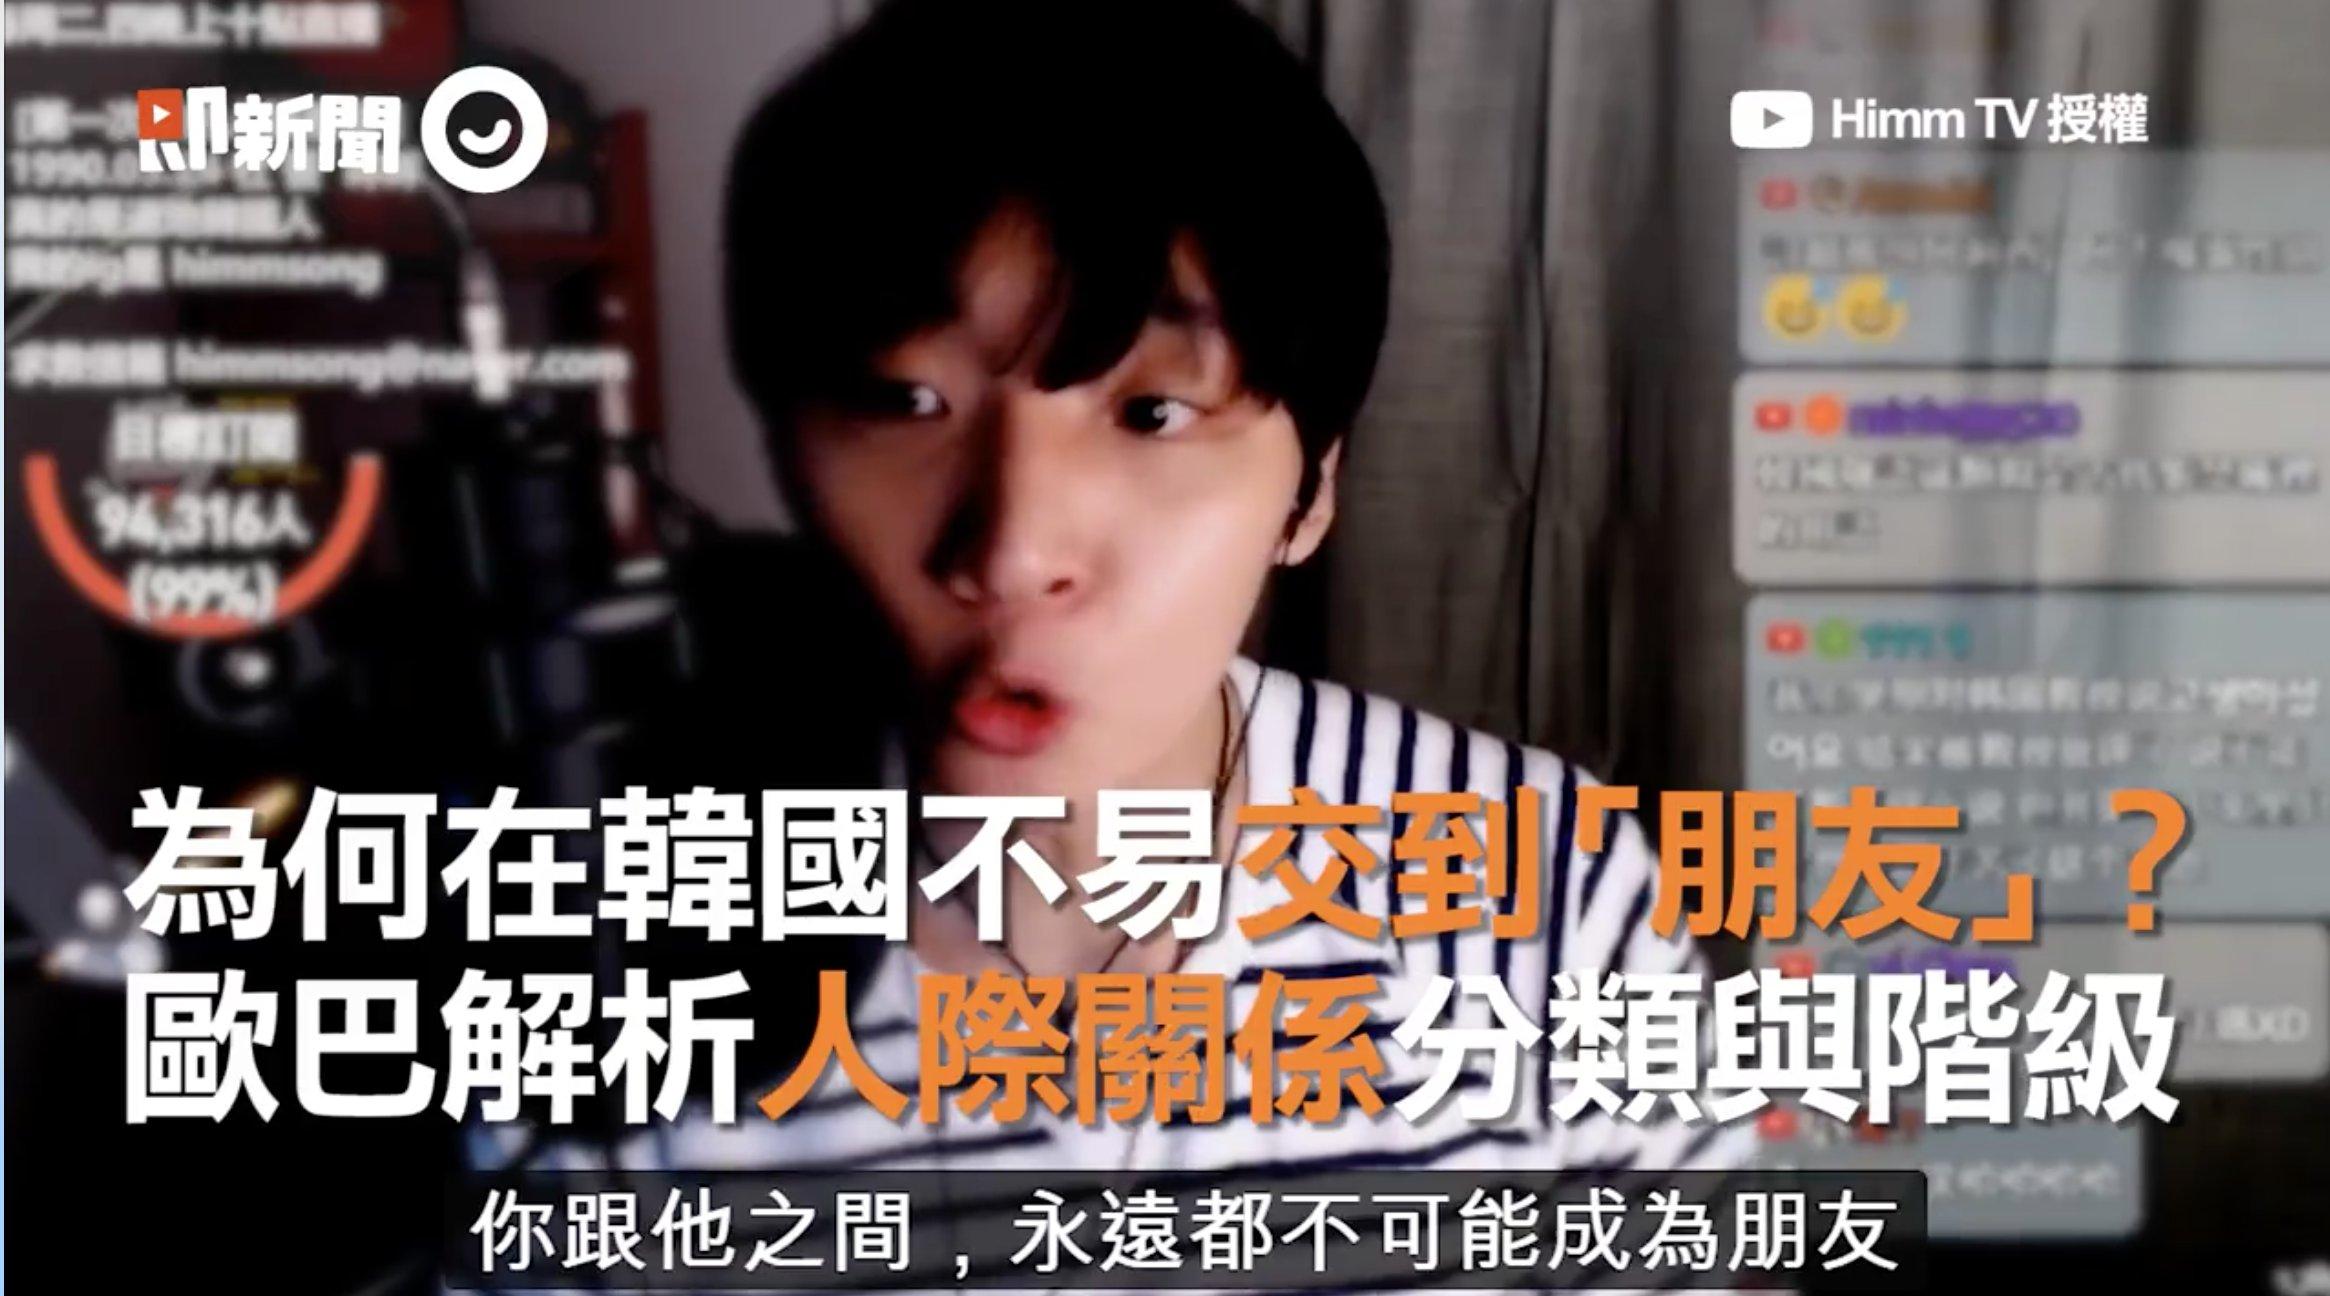 screen shot 2018 10 03 at 4 40 19 pm.png?resize=1200,630 - 為何在韓國不易交到「朋友」? 歐爸解析韓國人際生態:「一句話定生死!」